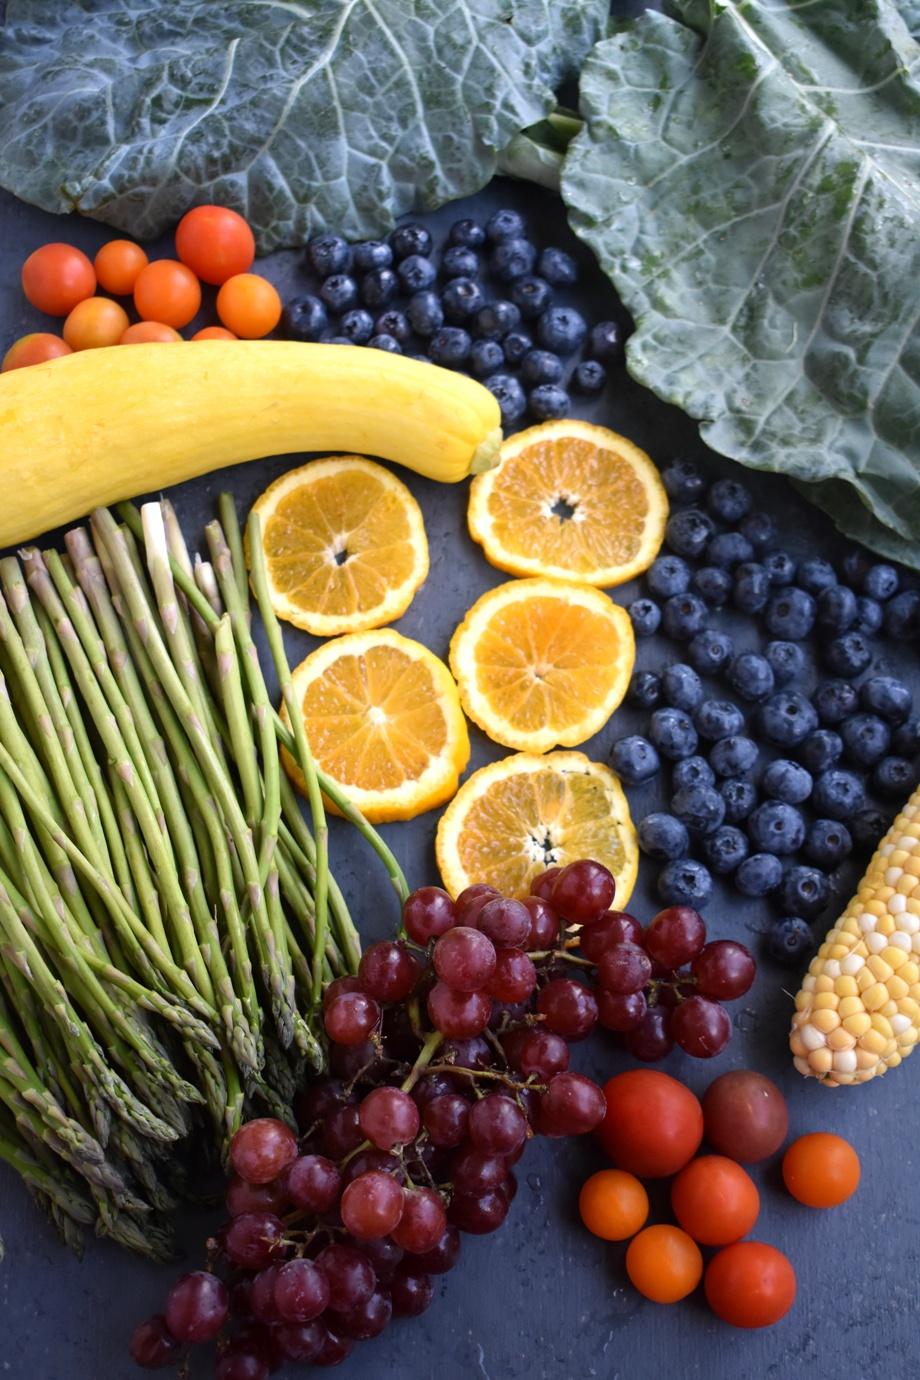 healthy nutrition marliz schouten - HD800×1200